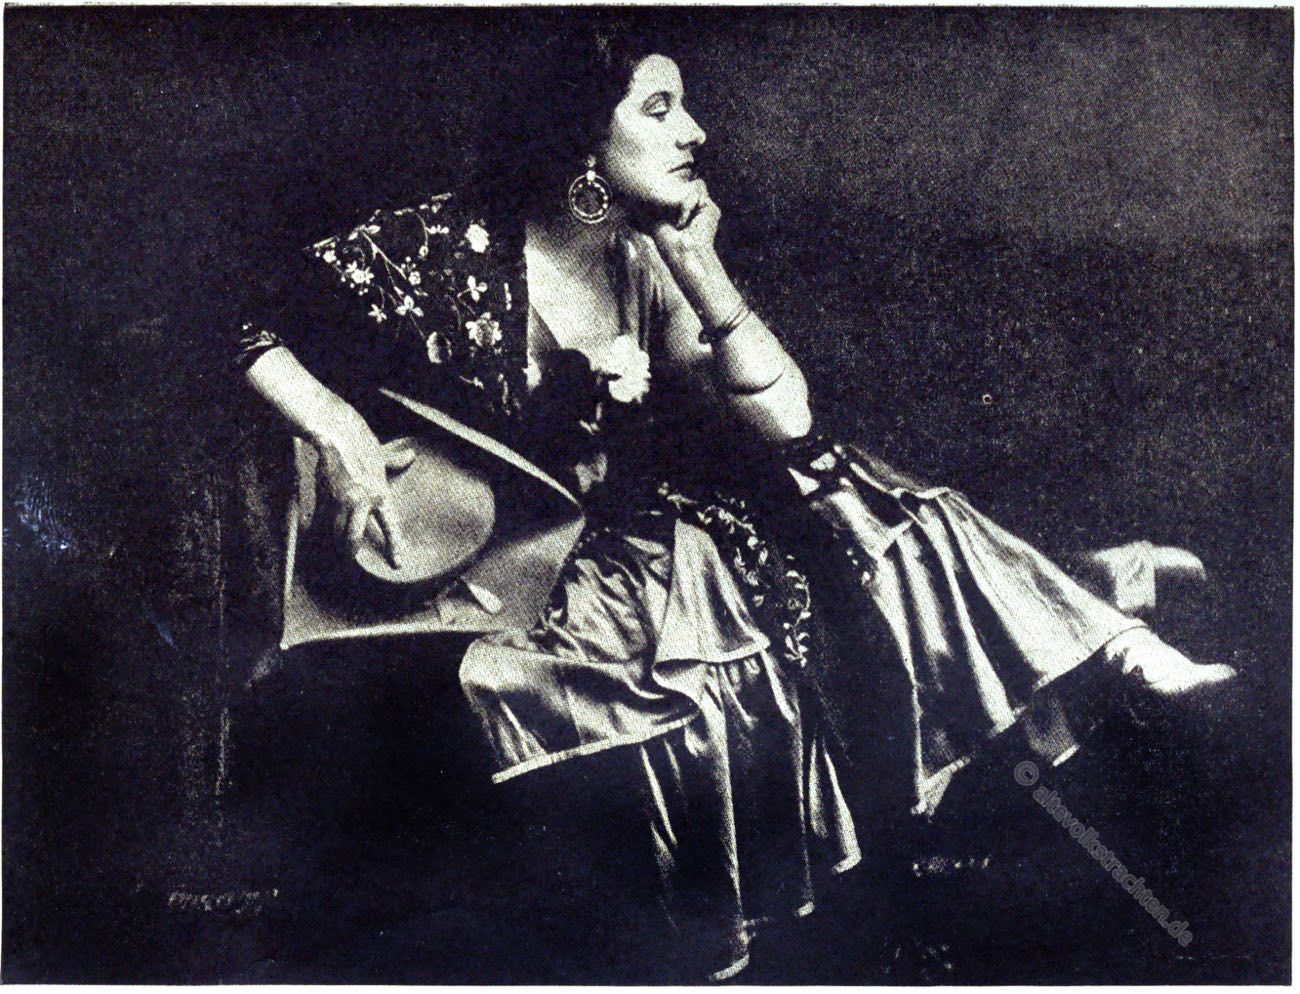 Geraldine Farrar, Carmen, opera, costume, stage costumes